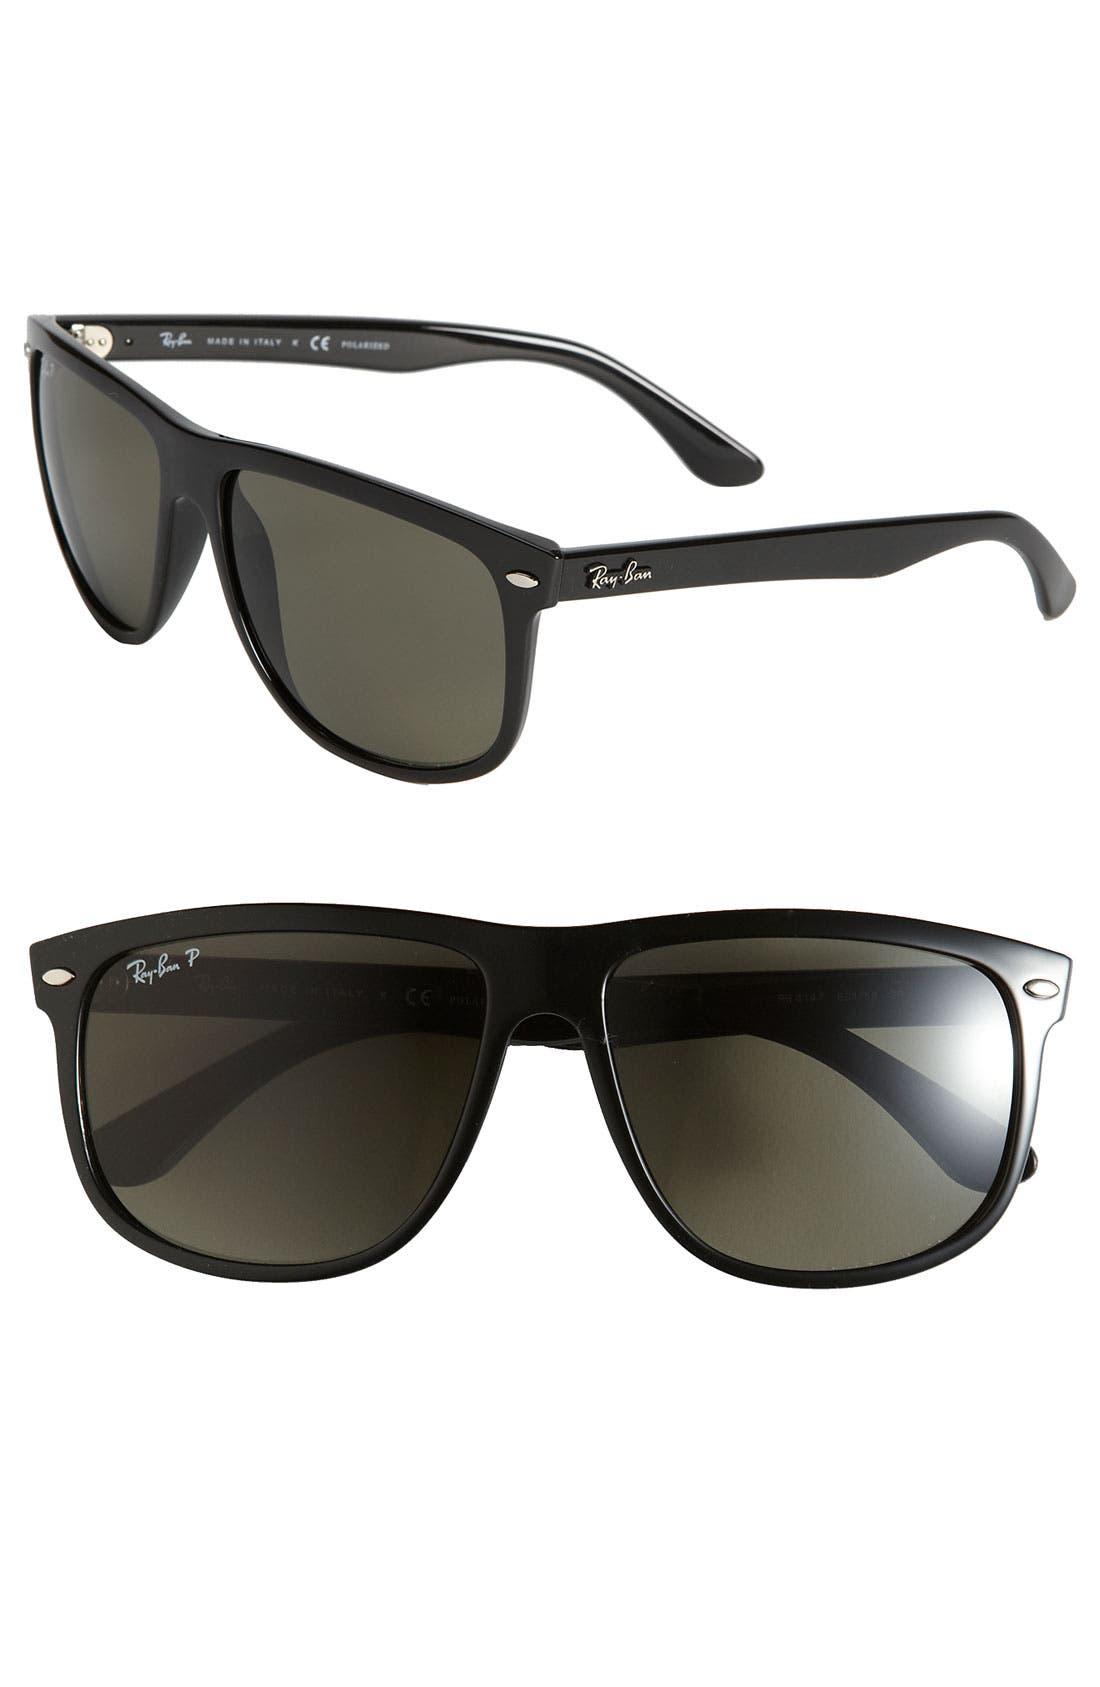 RAY-BAN, Highstreet 60mm Polarized Flat Top Sunglasses, Main thumbnail 1, color, BLACK POLARIZED